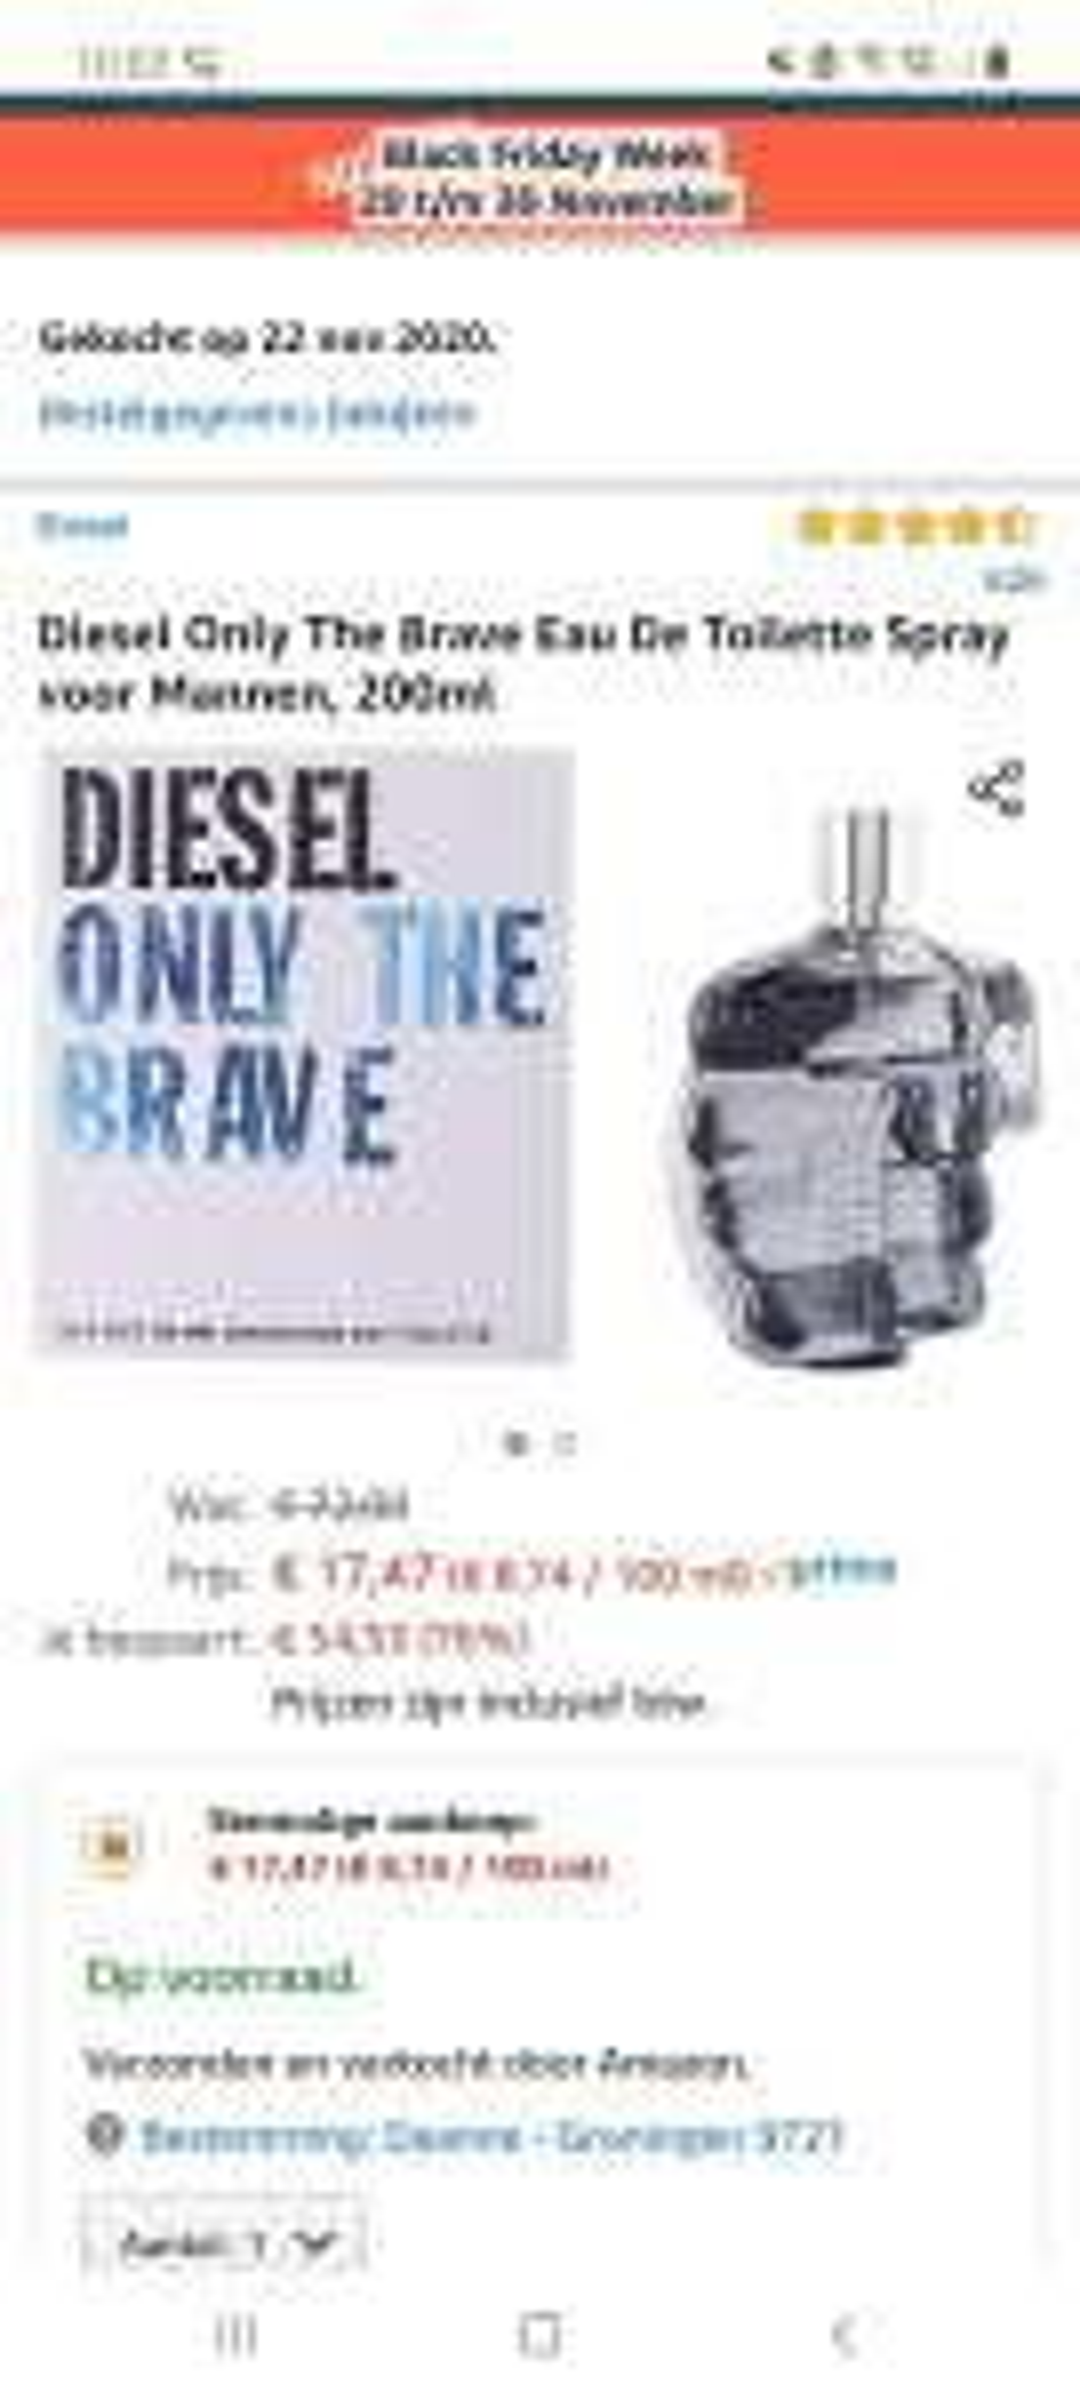 Diesel only the brave 200ml voor 17,47